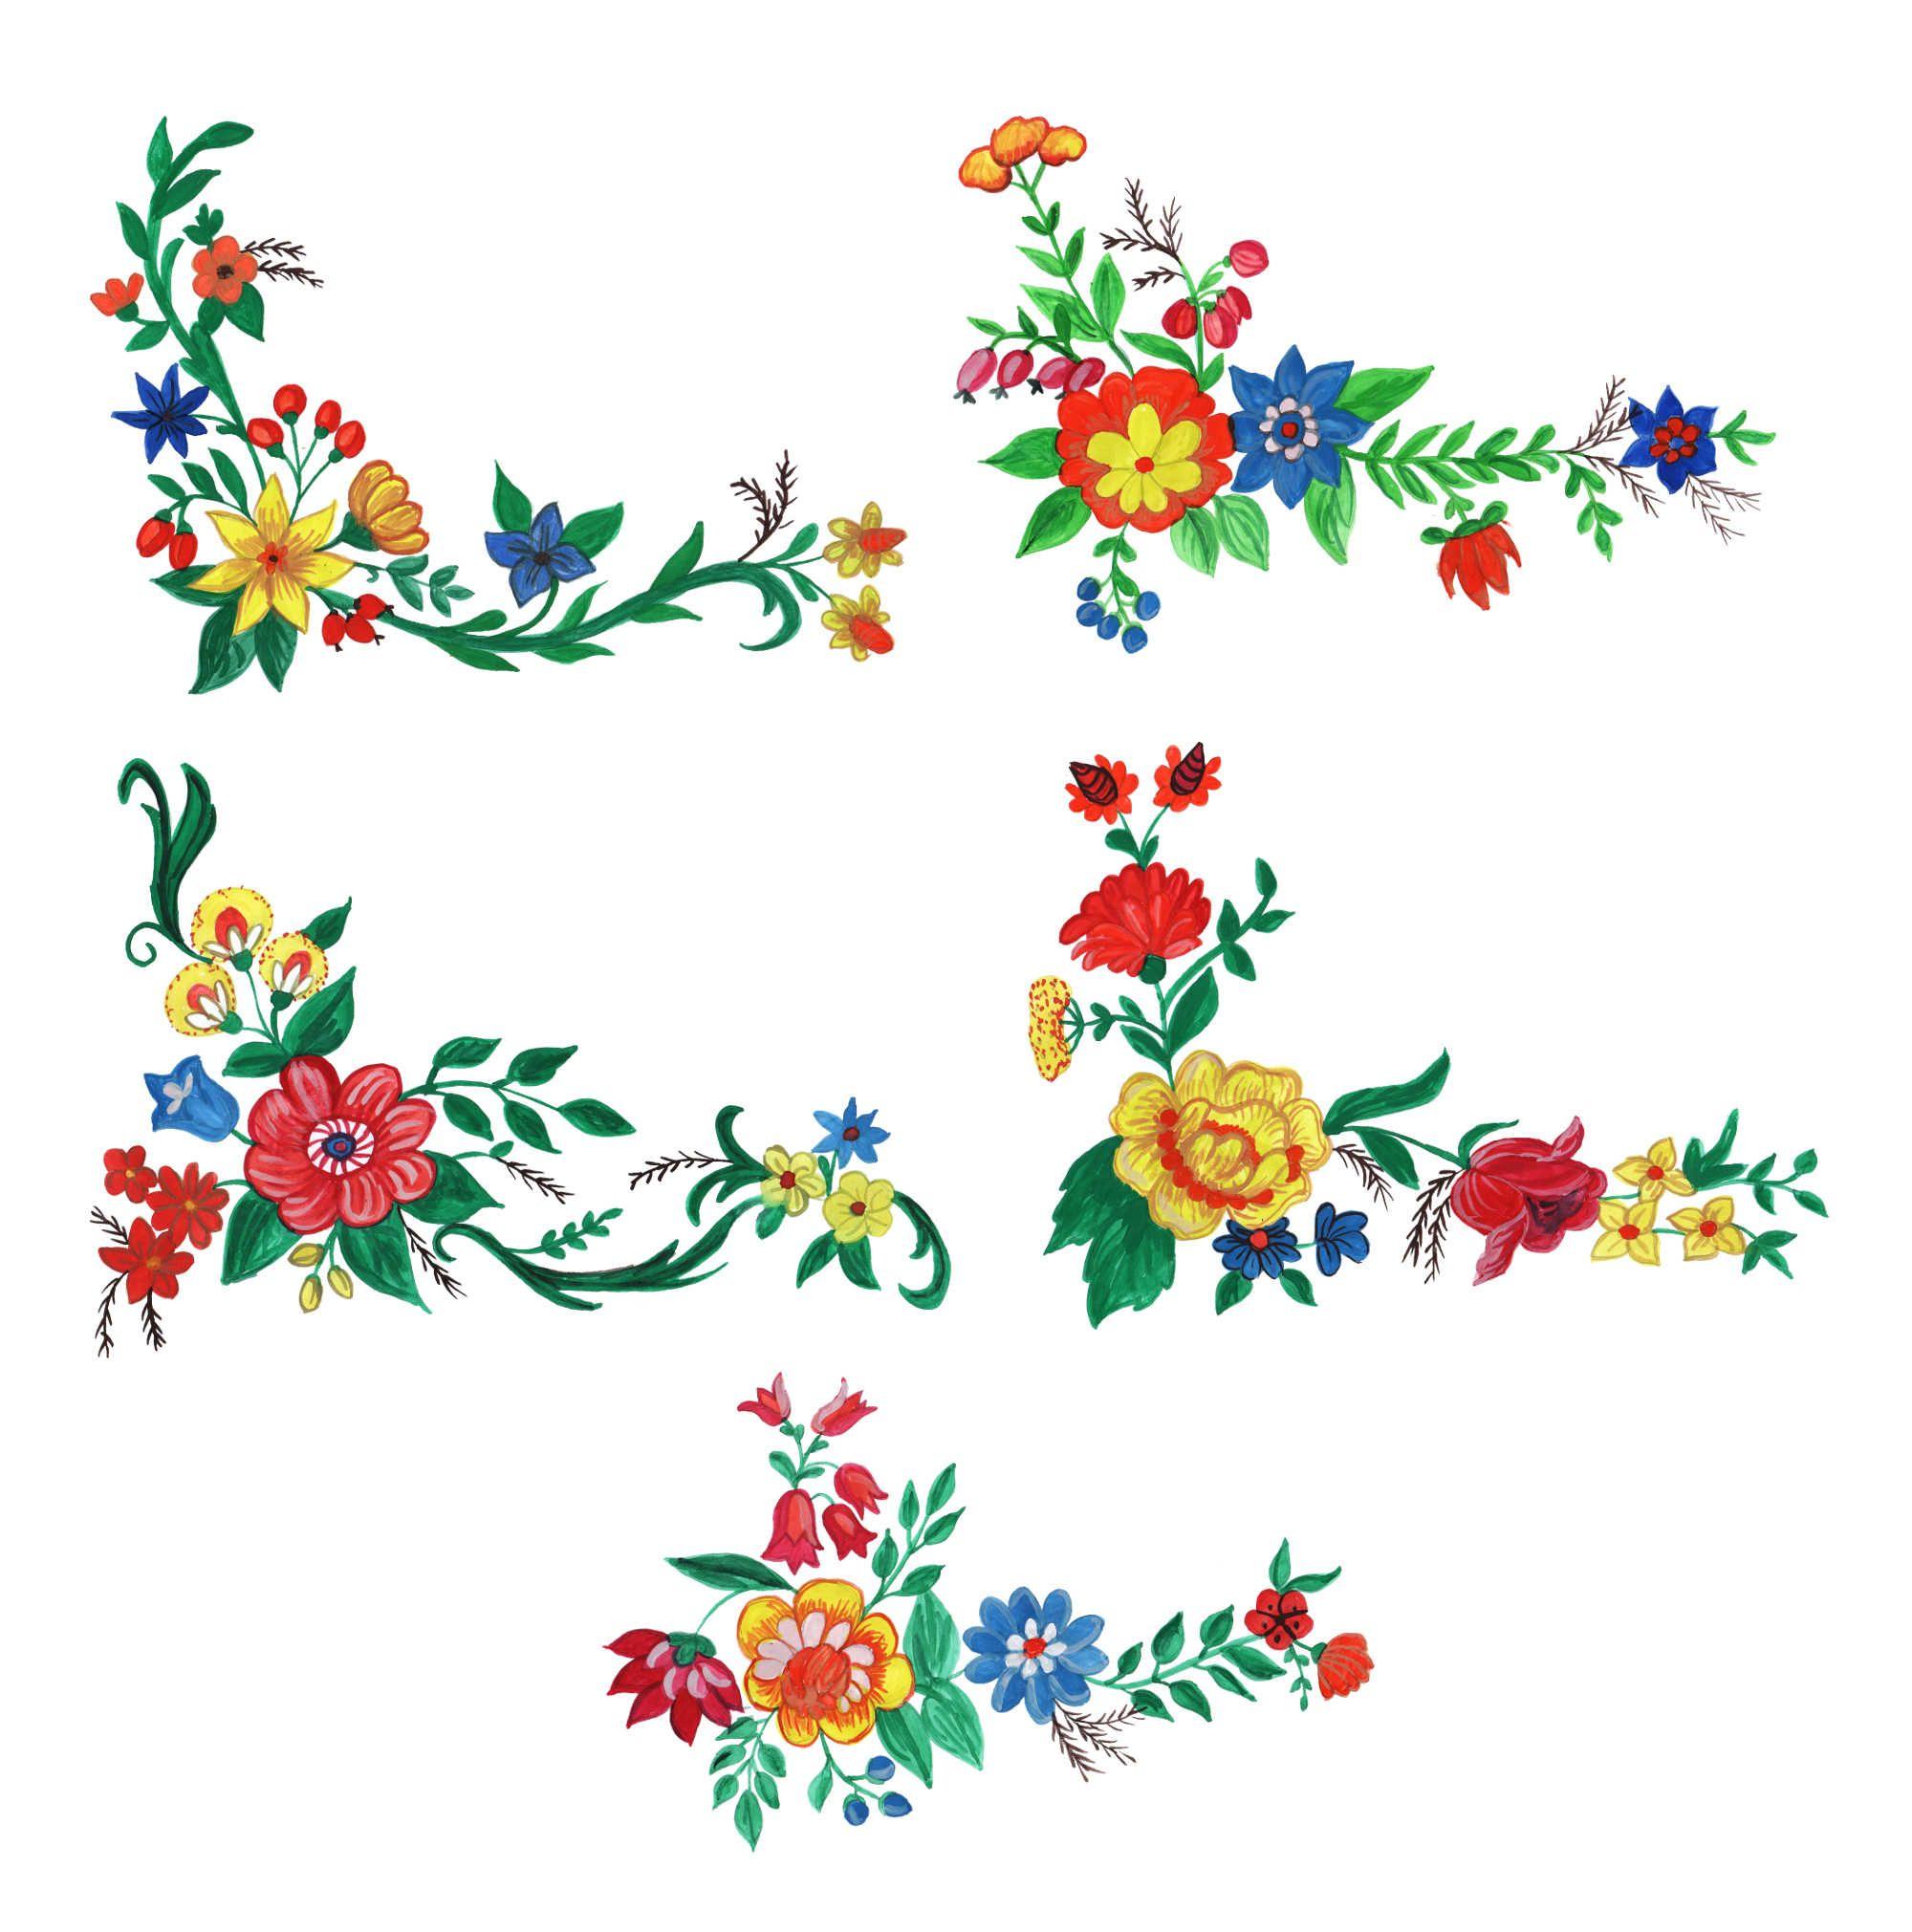 5 Watercolor Flower Corner Png Transparent Vol 2 Onlygfx Com Watercolor Flowers Watercolor Flowers